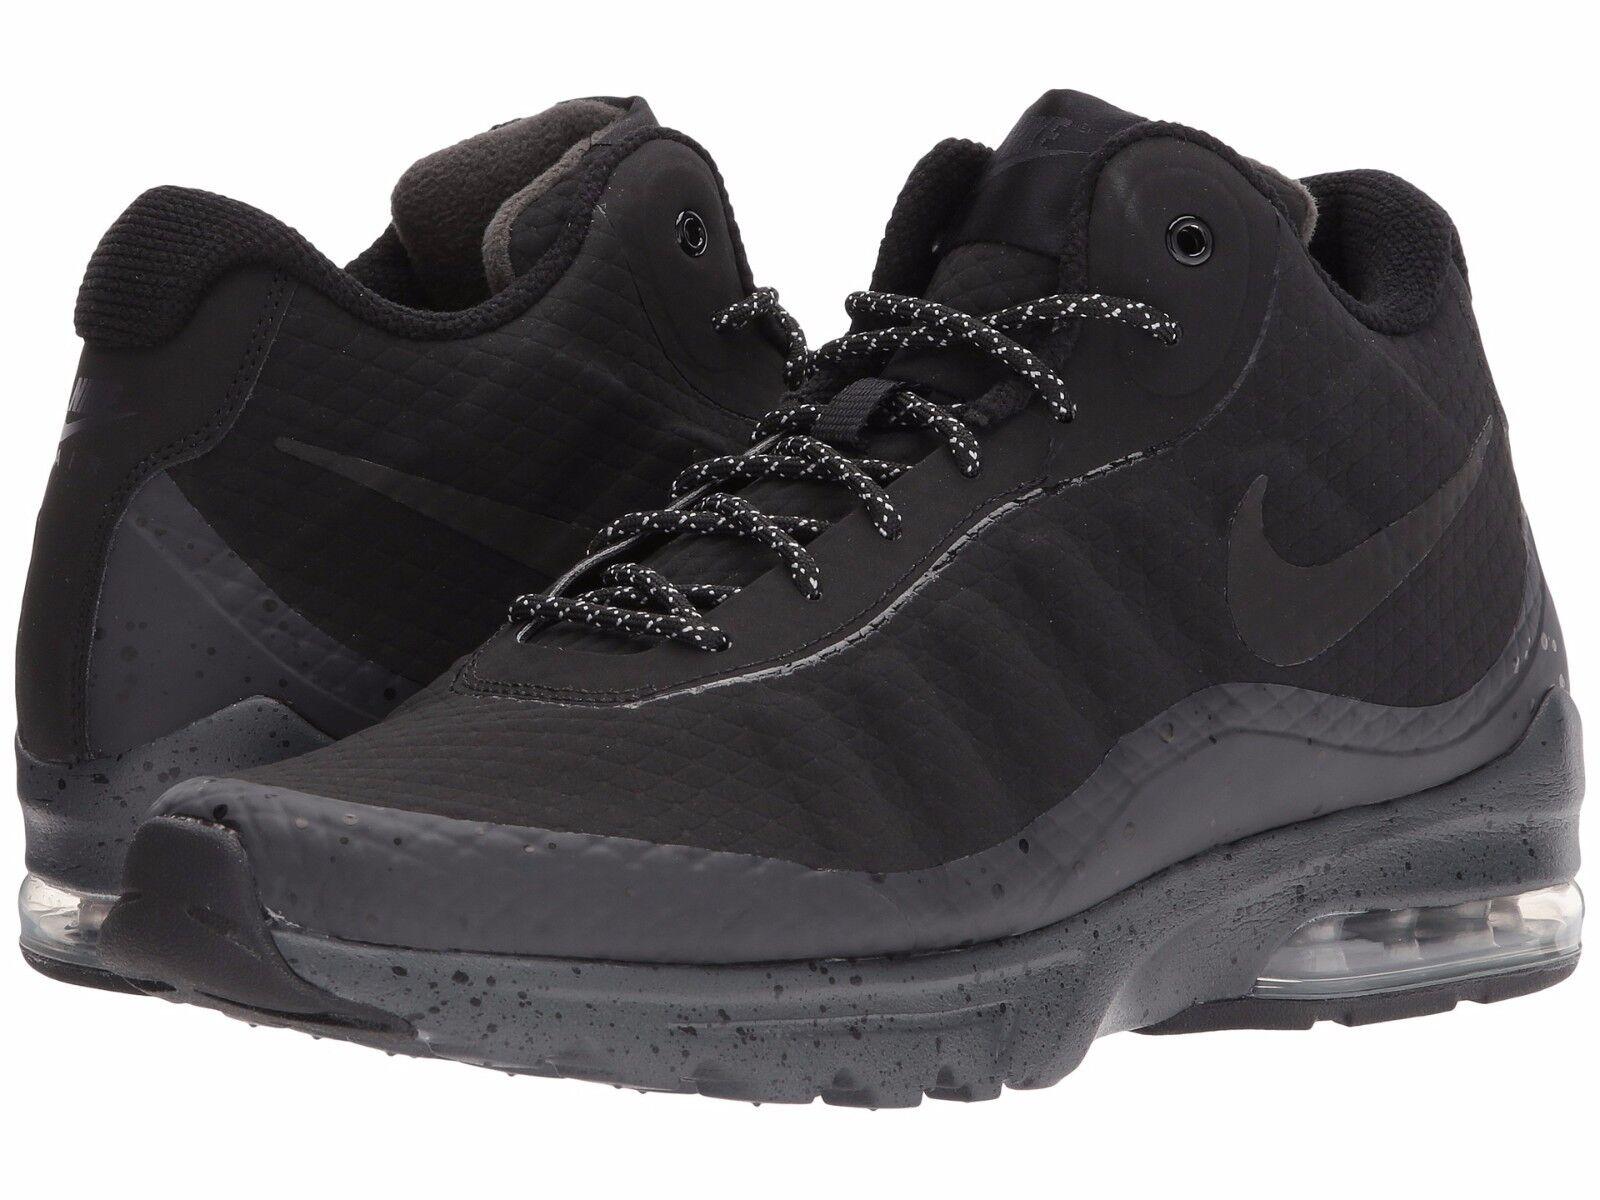 Men's Nike Air Max Invigor Mid Black Black-Anthracite Boot 858654-004